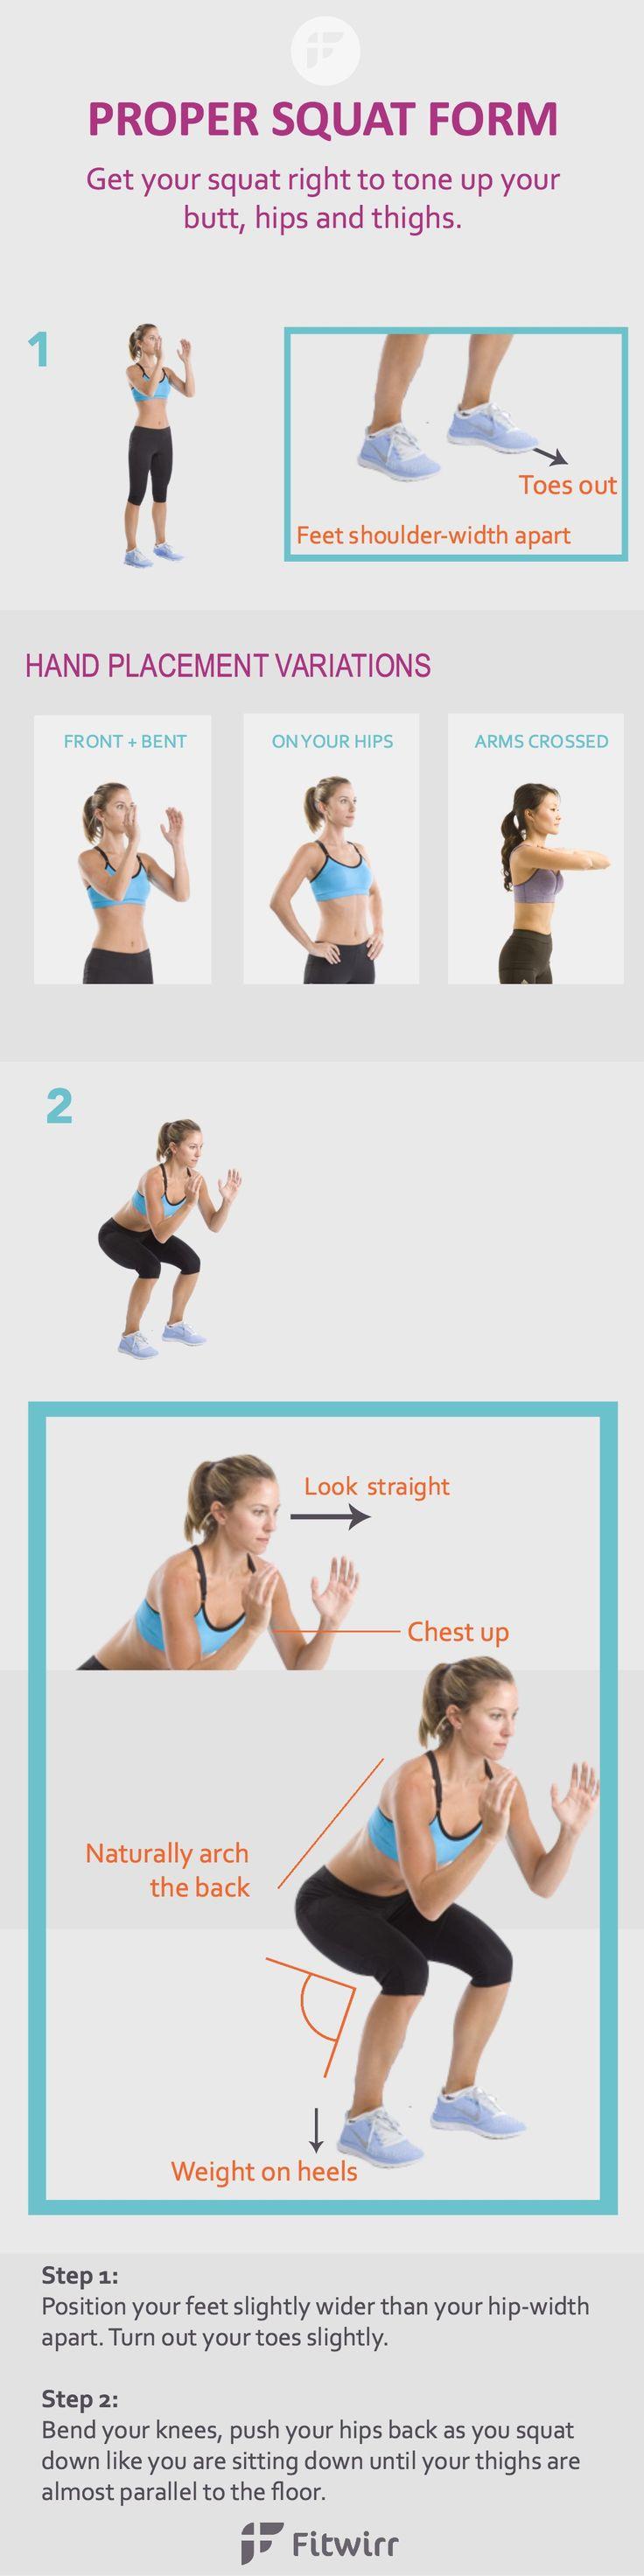 A proper squat form guide to better squats